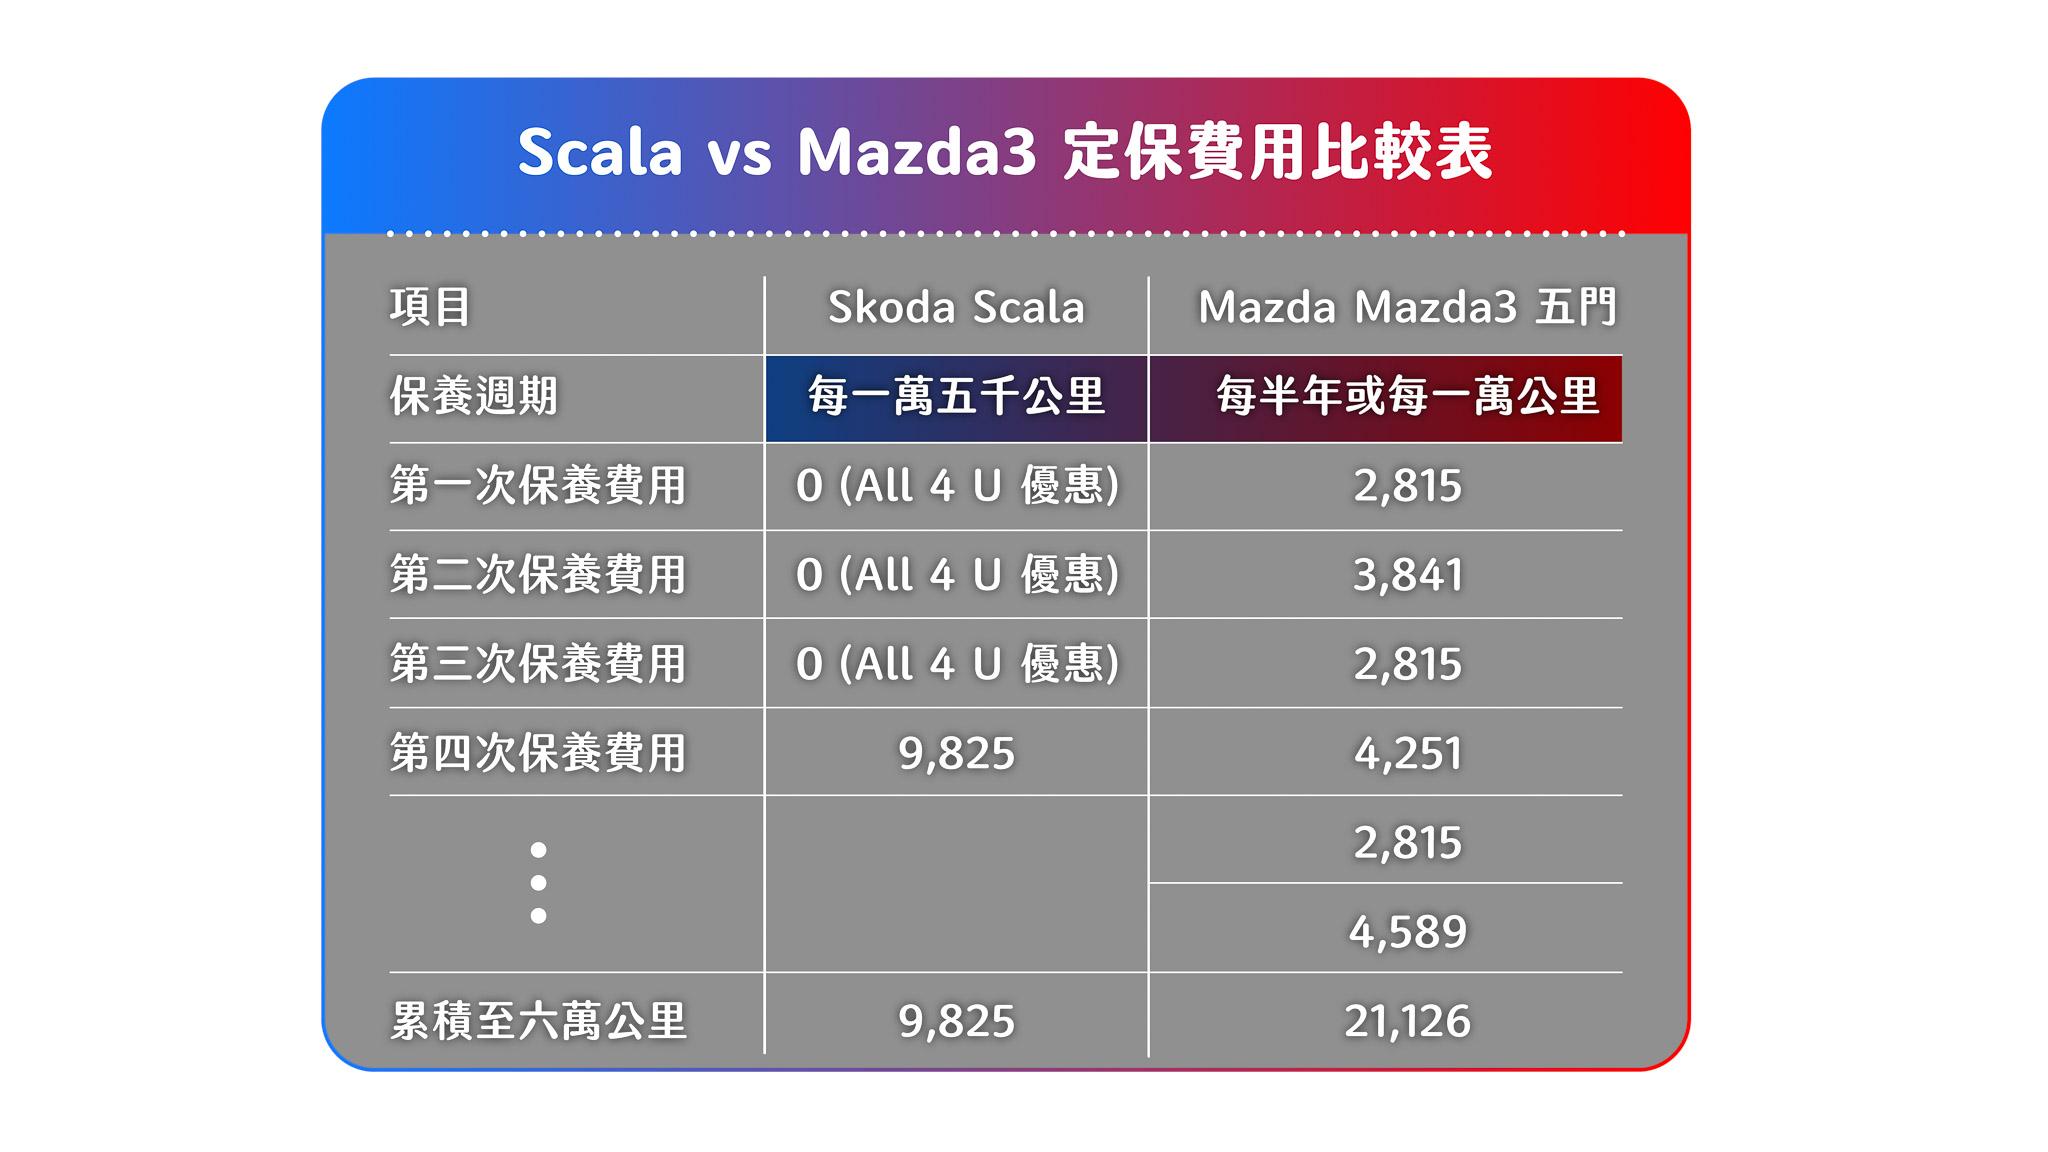 Skoda 因為有推出 All 4 U 保養優惠專案,所以前三次保養不用錢,到六萬公里,基本上 Scala 才進行一次保養,為兩者關鍵差異處。